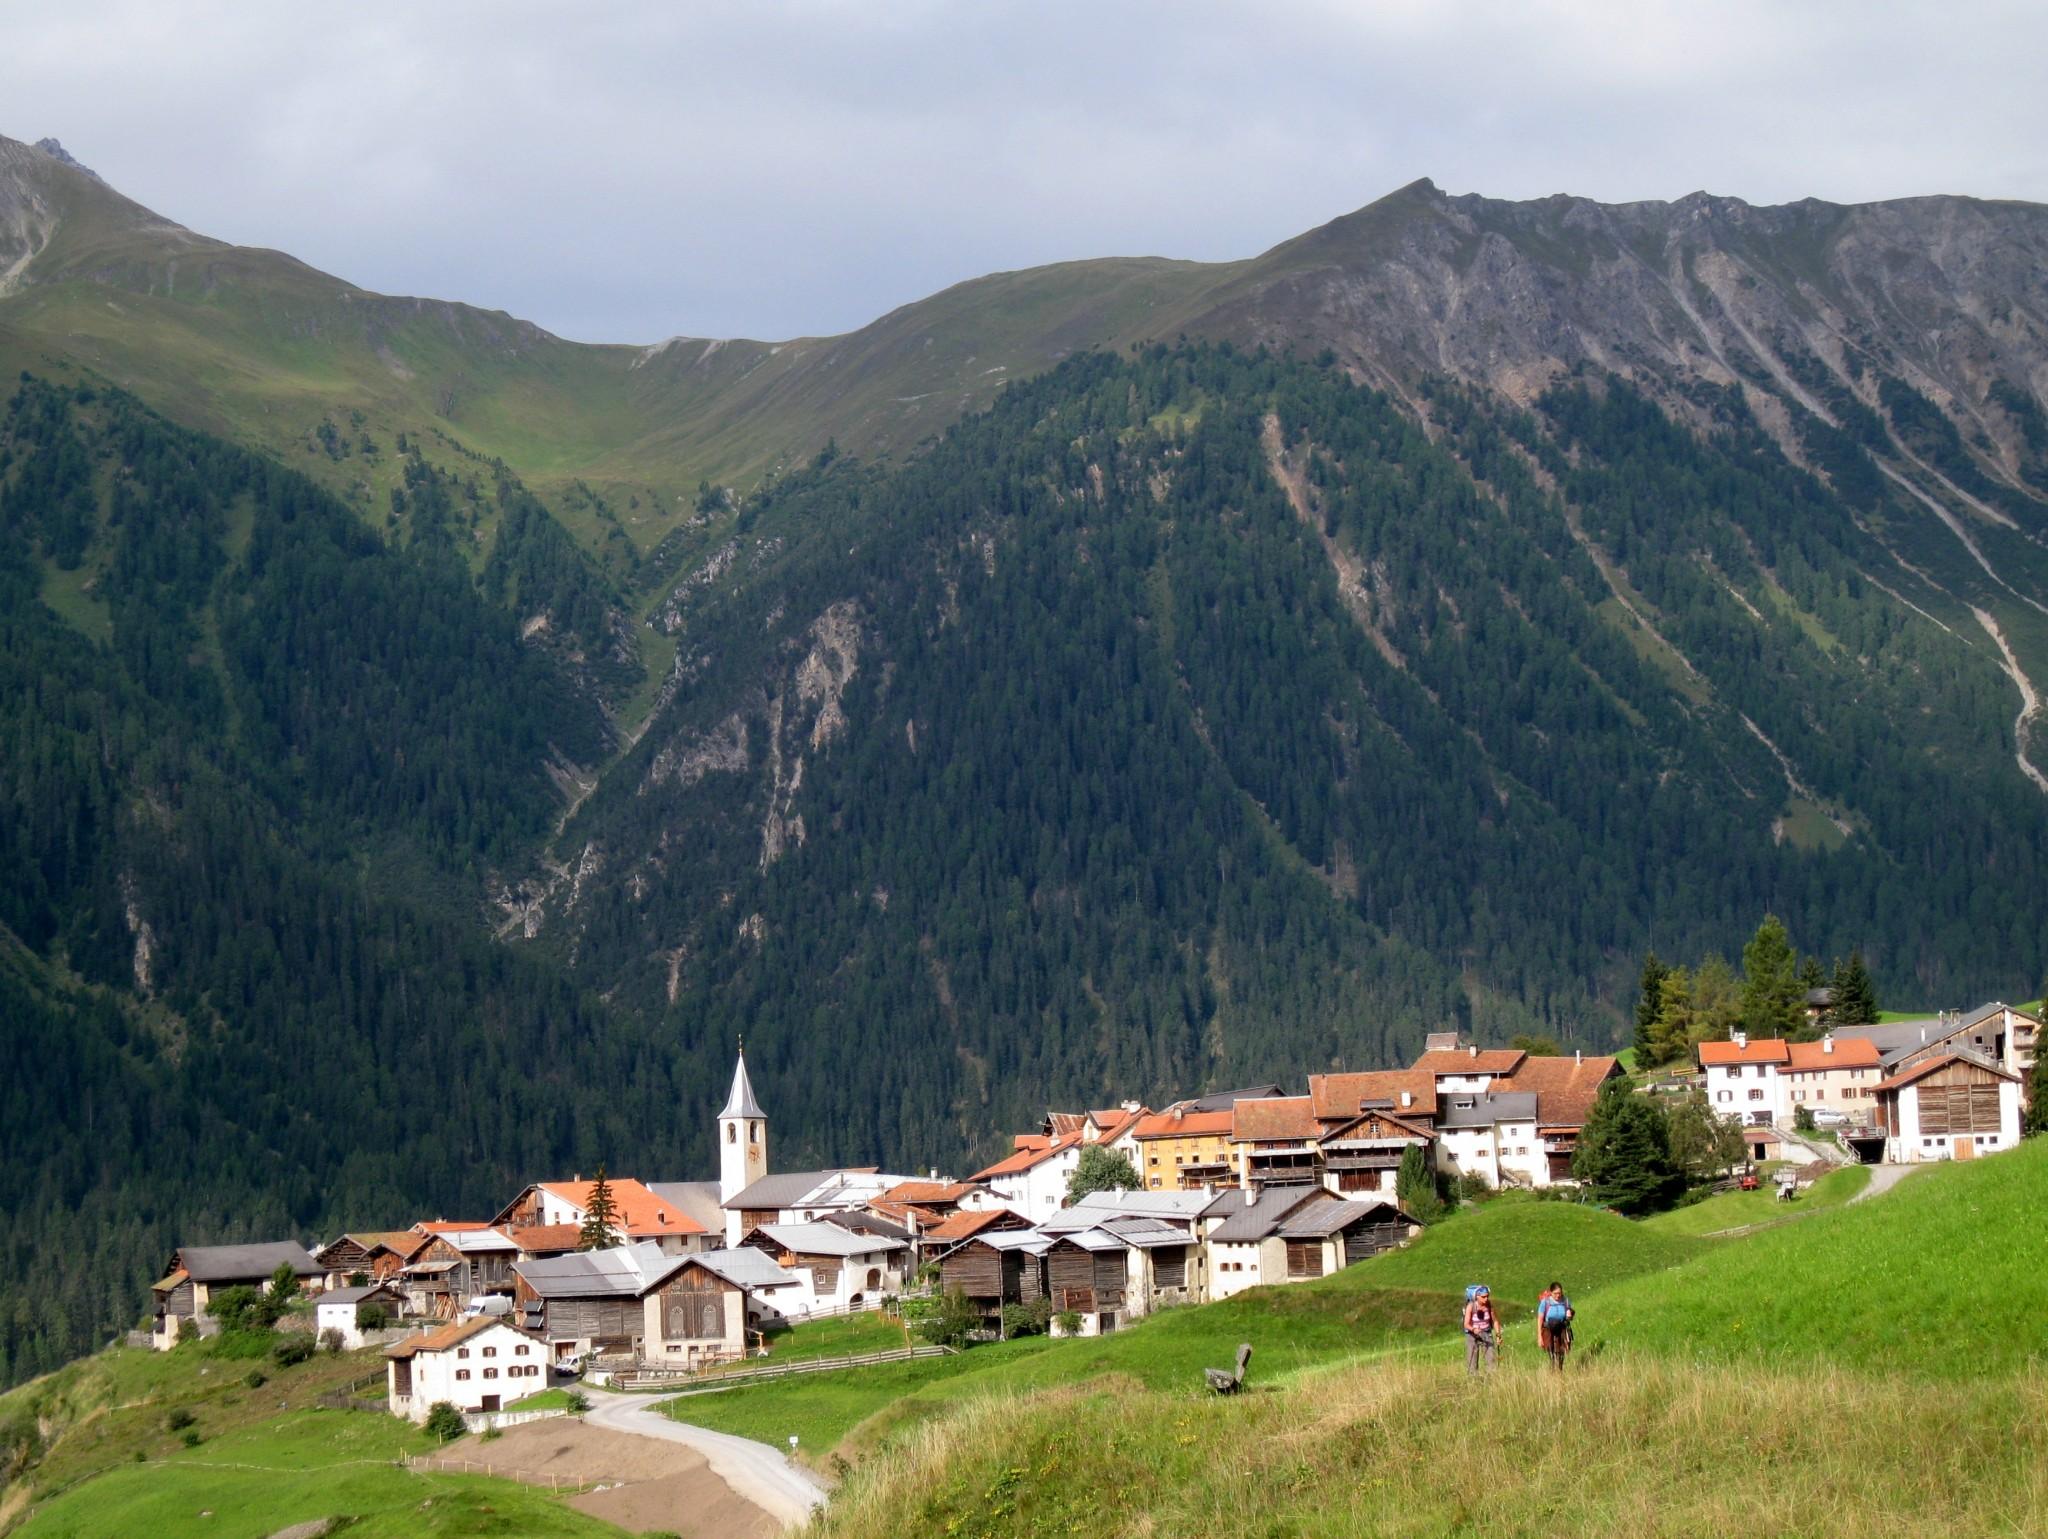 Hut-to-hut, Bergün to Klosters